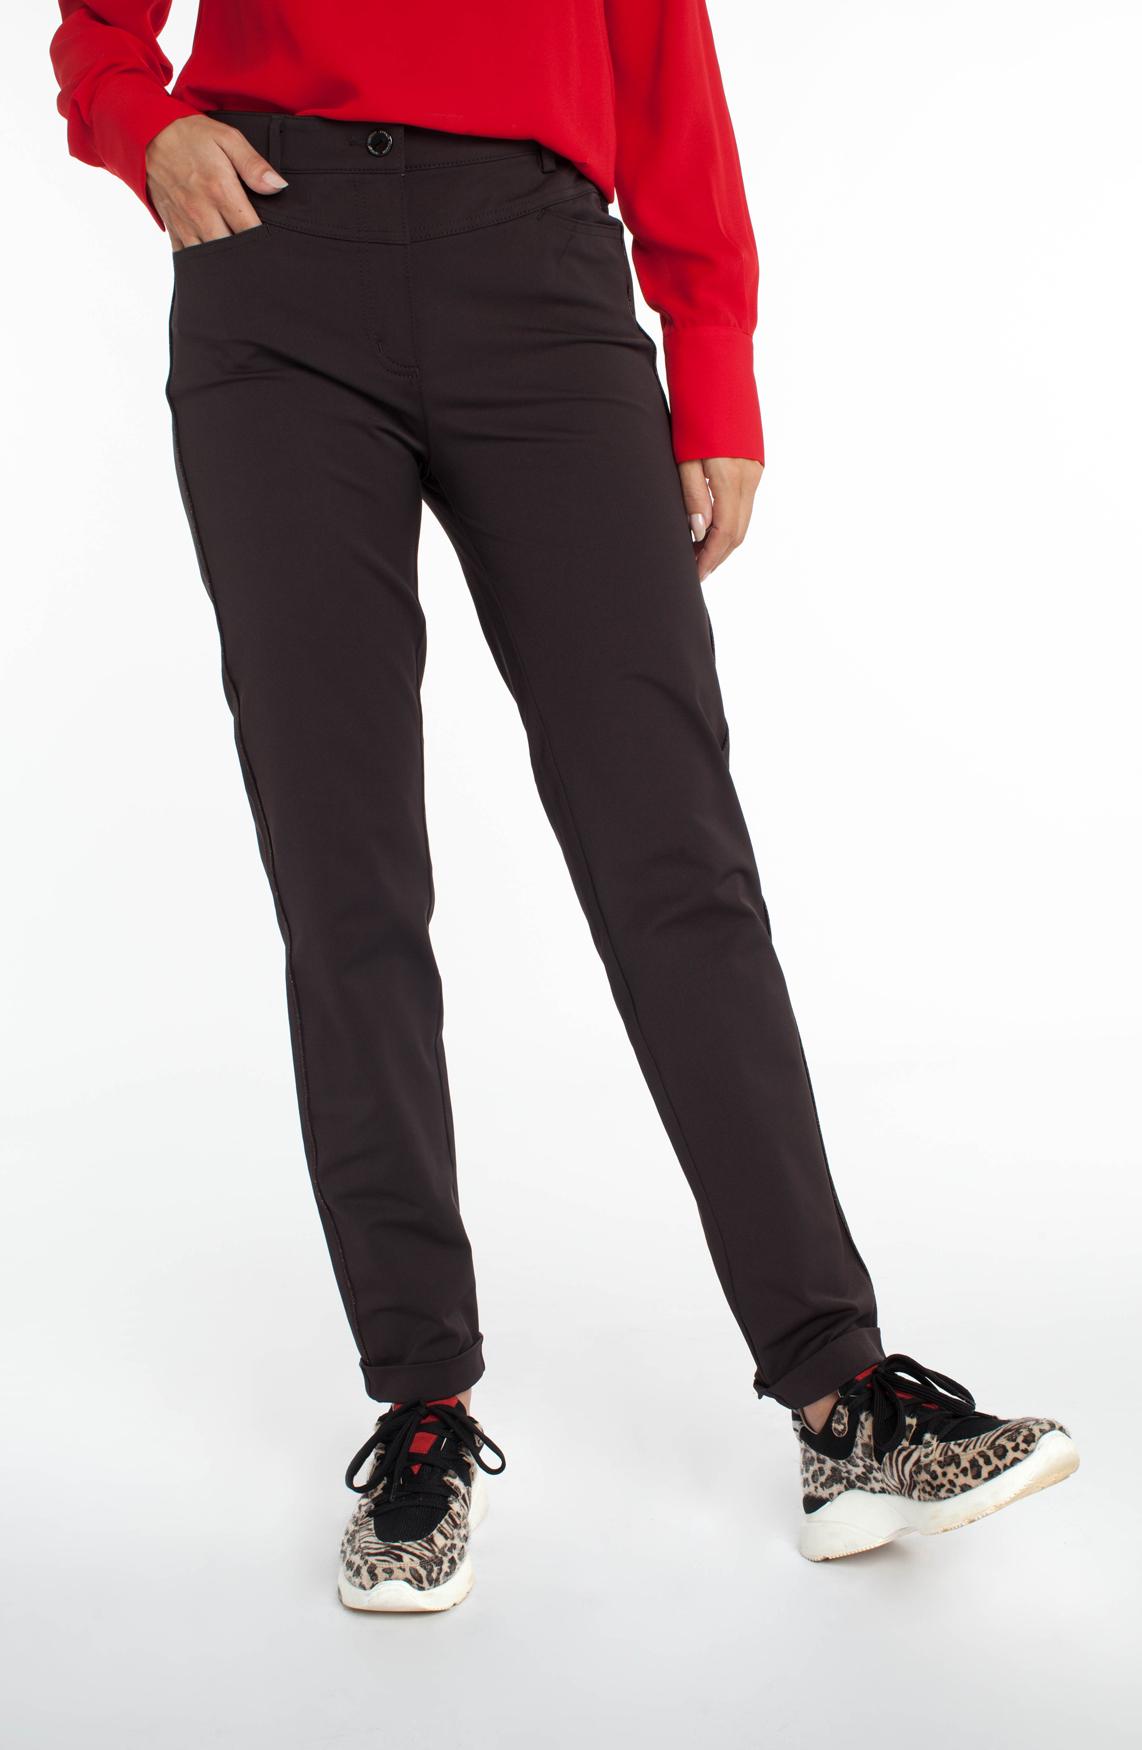 Rosner Dames Audrey pantalon Bruin